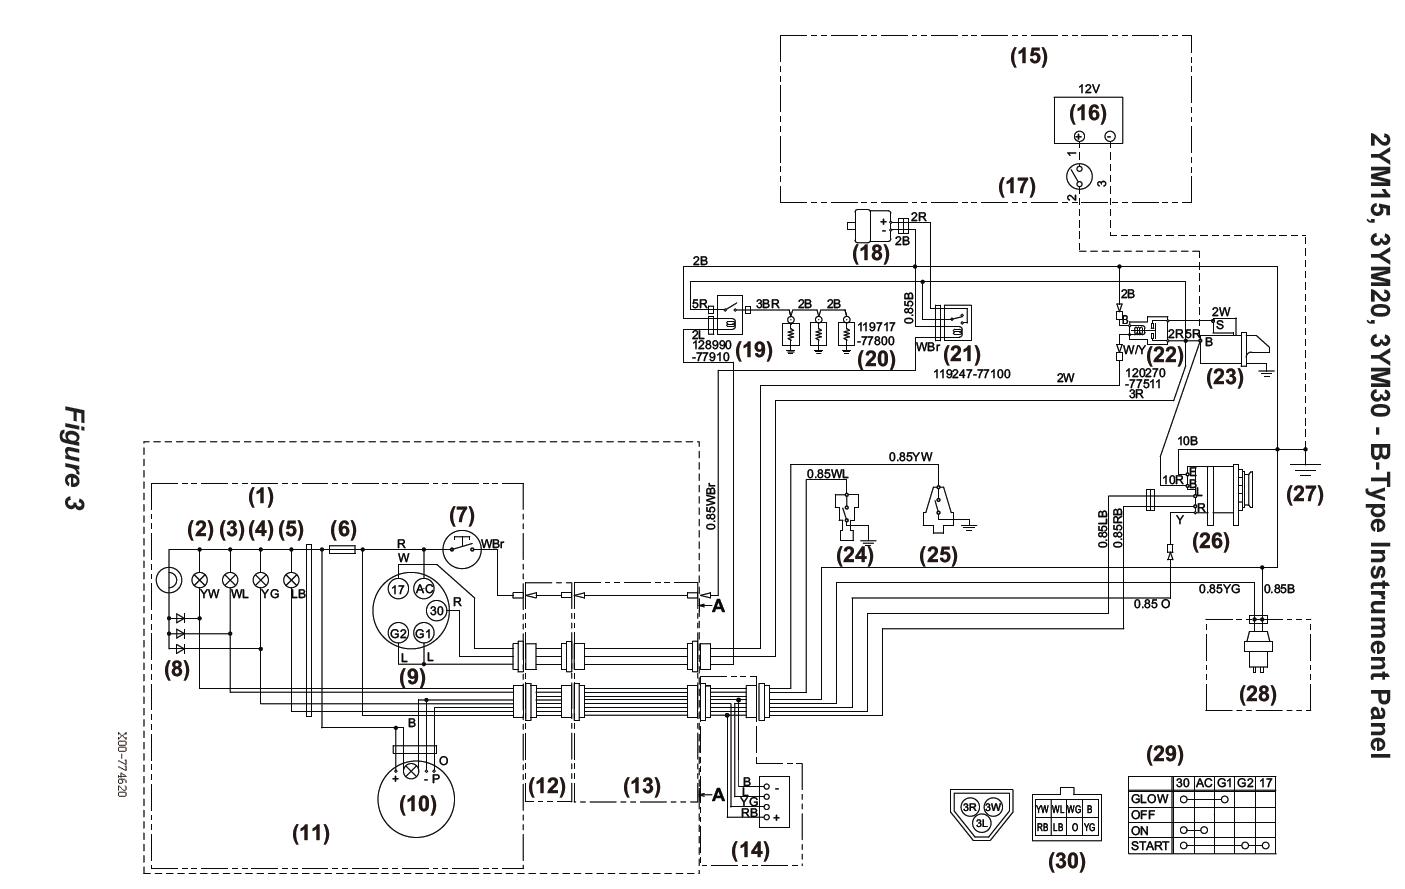 yanmar 2002d wiring diagram lights yanmar 2002d wiring diagram headlight switch